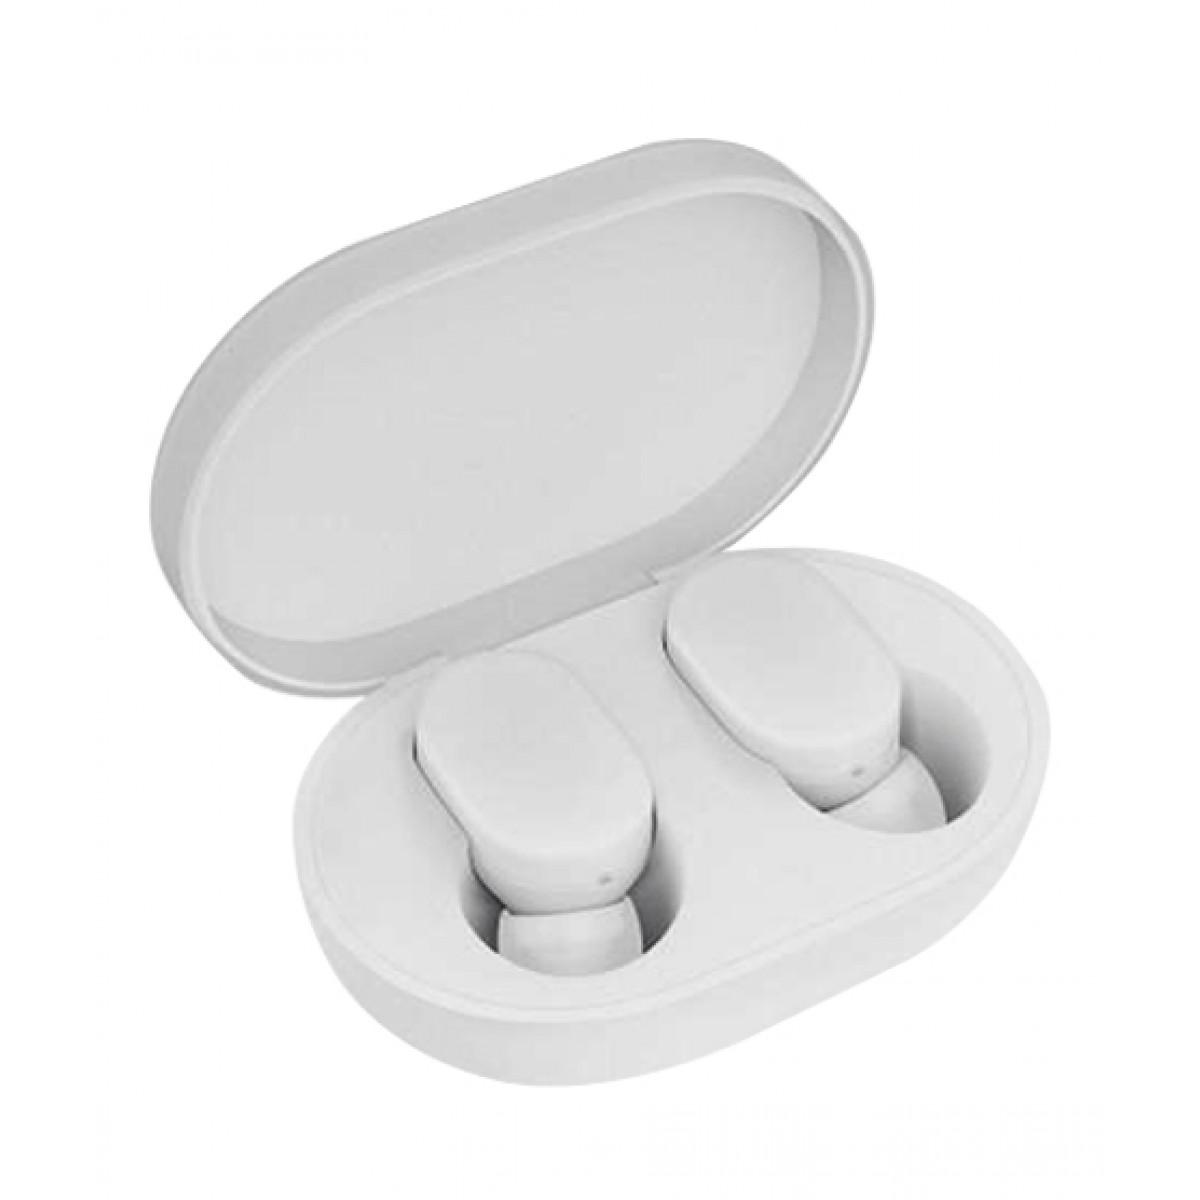 Xiaomi Mi Airdots Tws Bluetooth Earbuds Price In Pakistan Buy Xiaomi Mi Airdots Tws Wireless Earbuds White Ishopping Pk